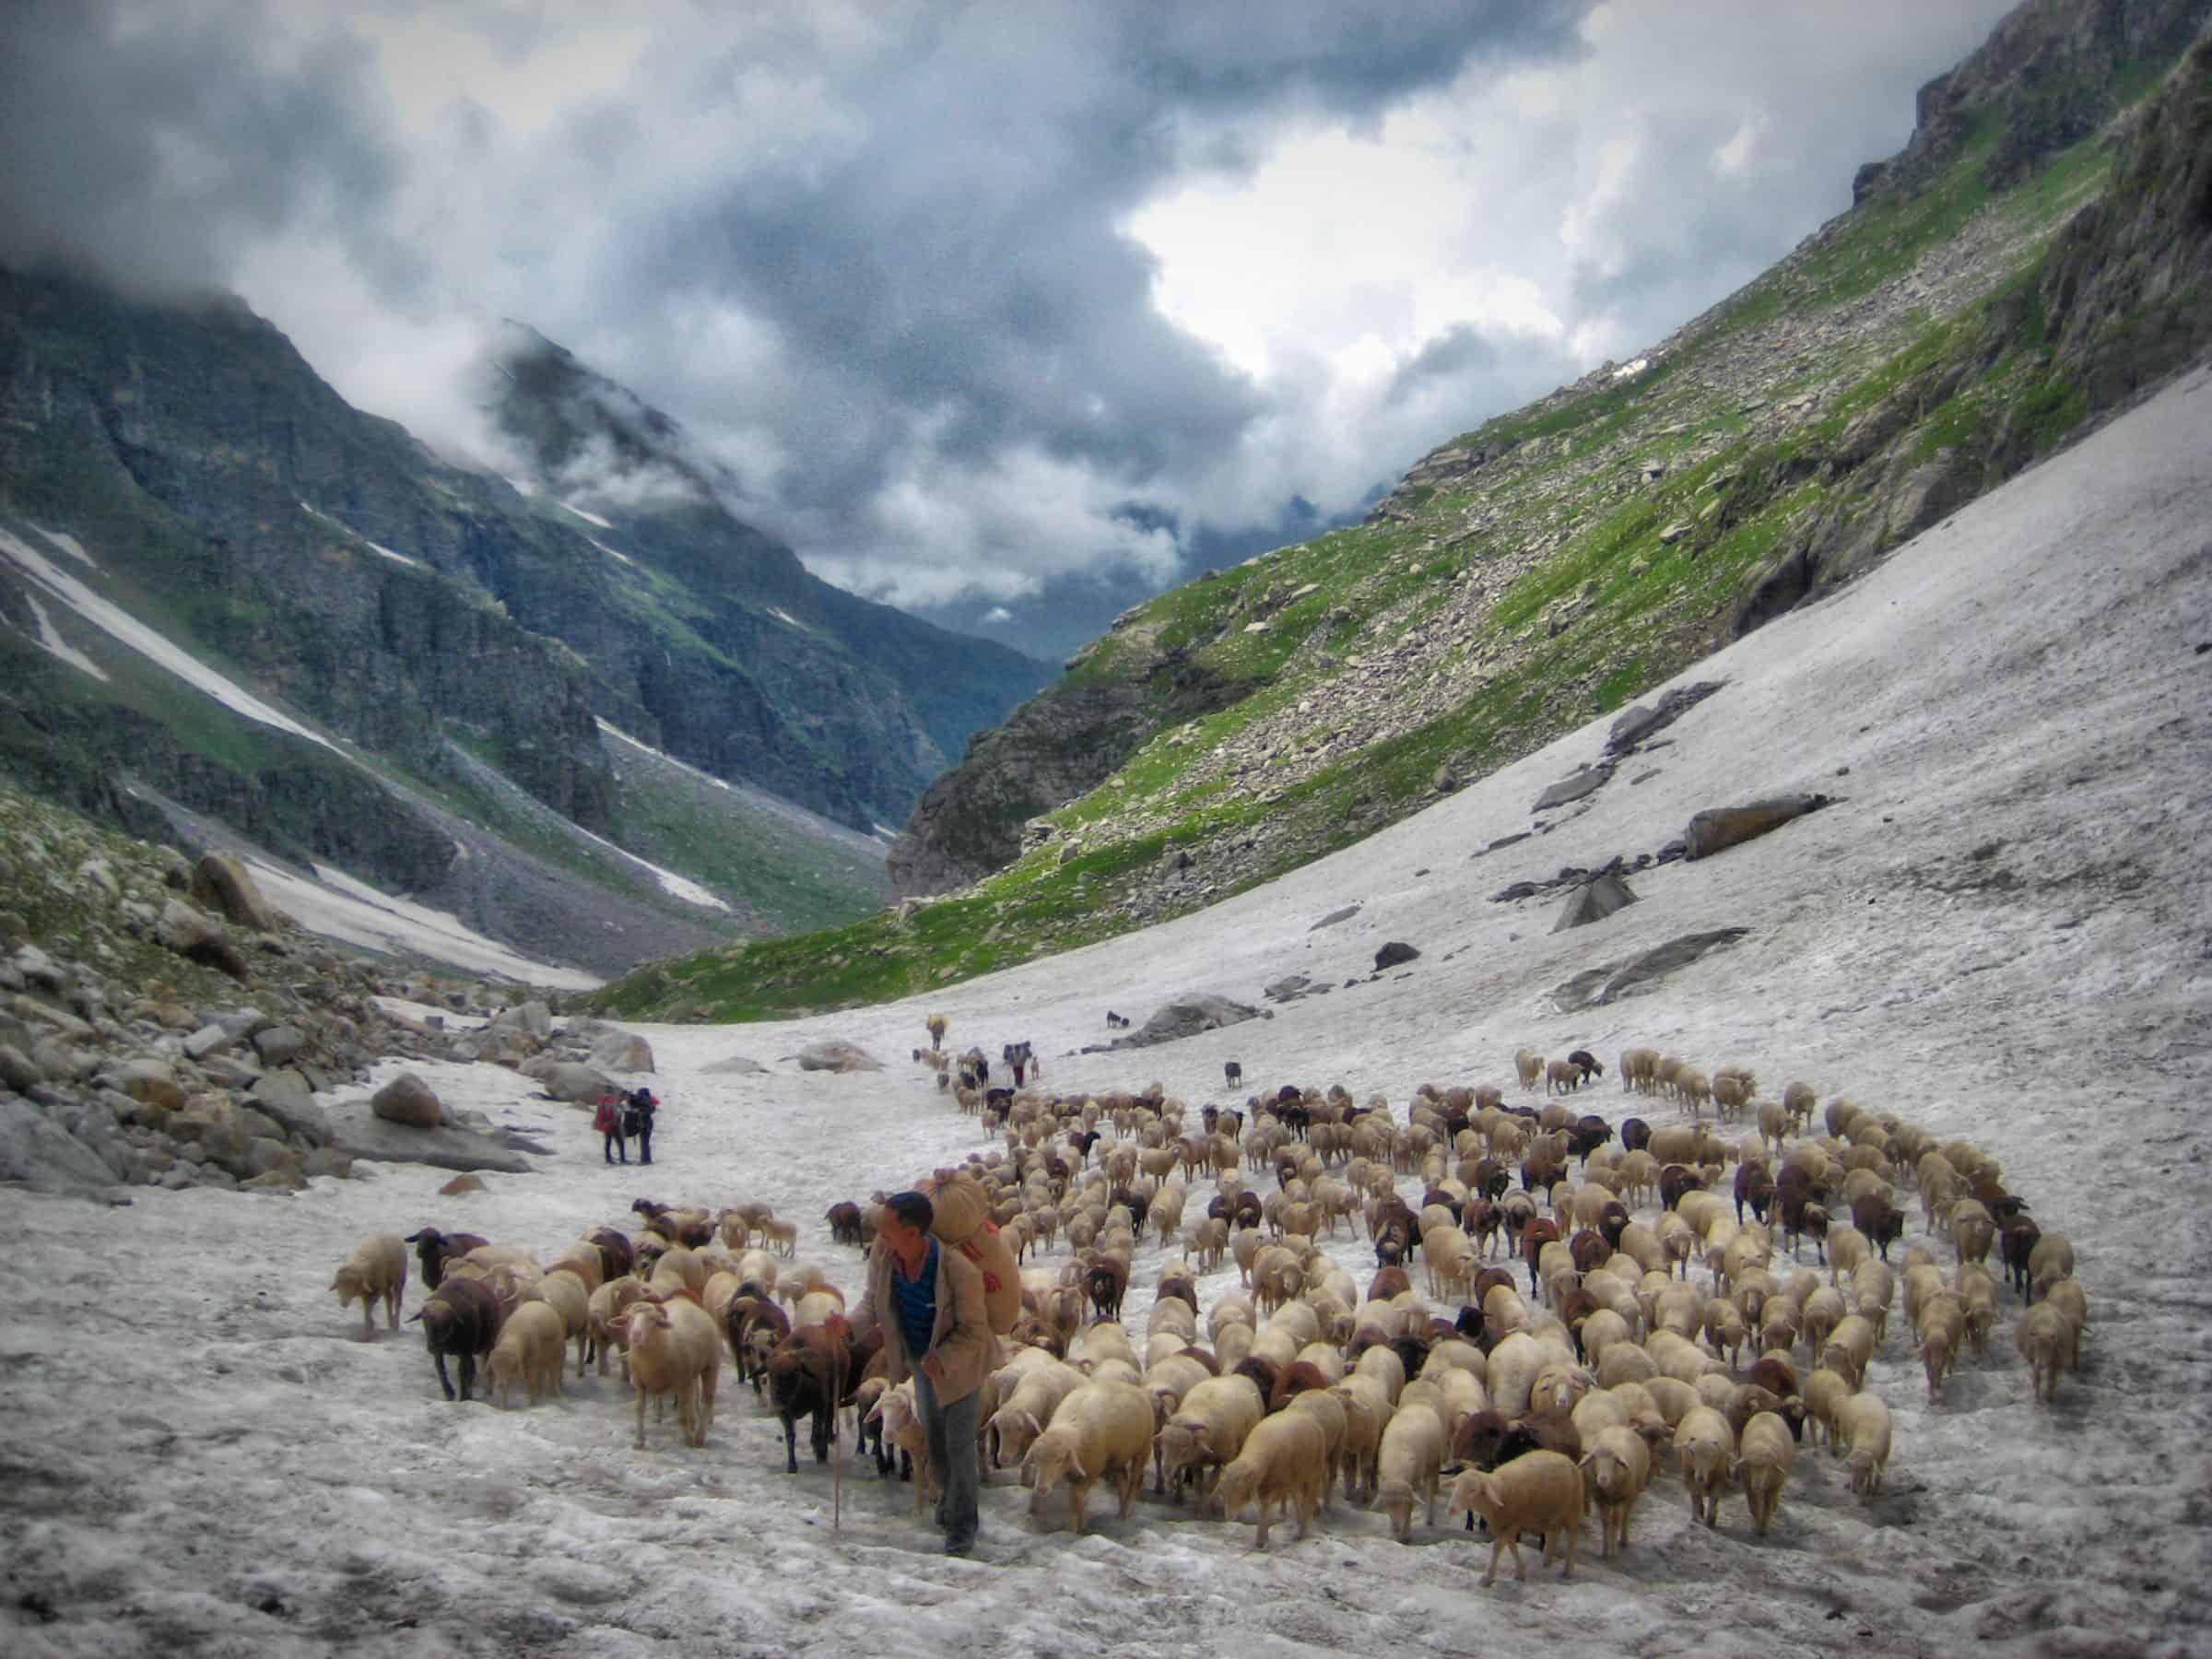 Ladakh landscape and livestock